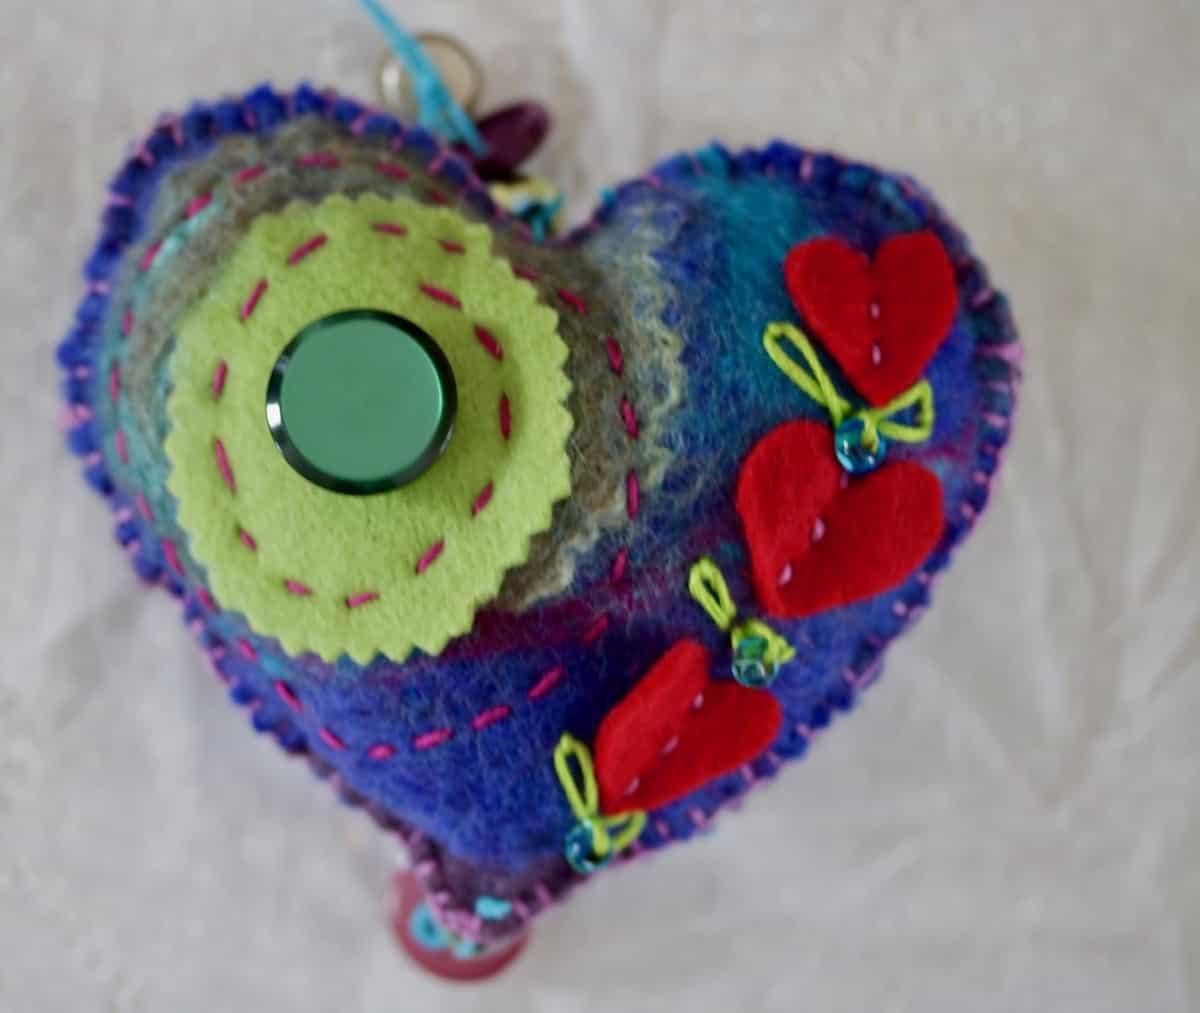 artistic heart made from felt